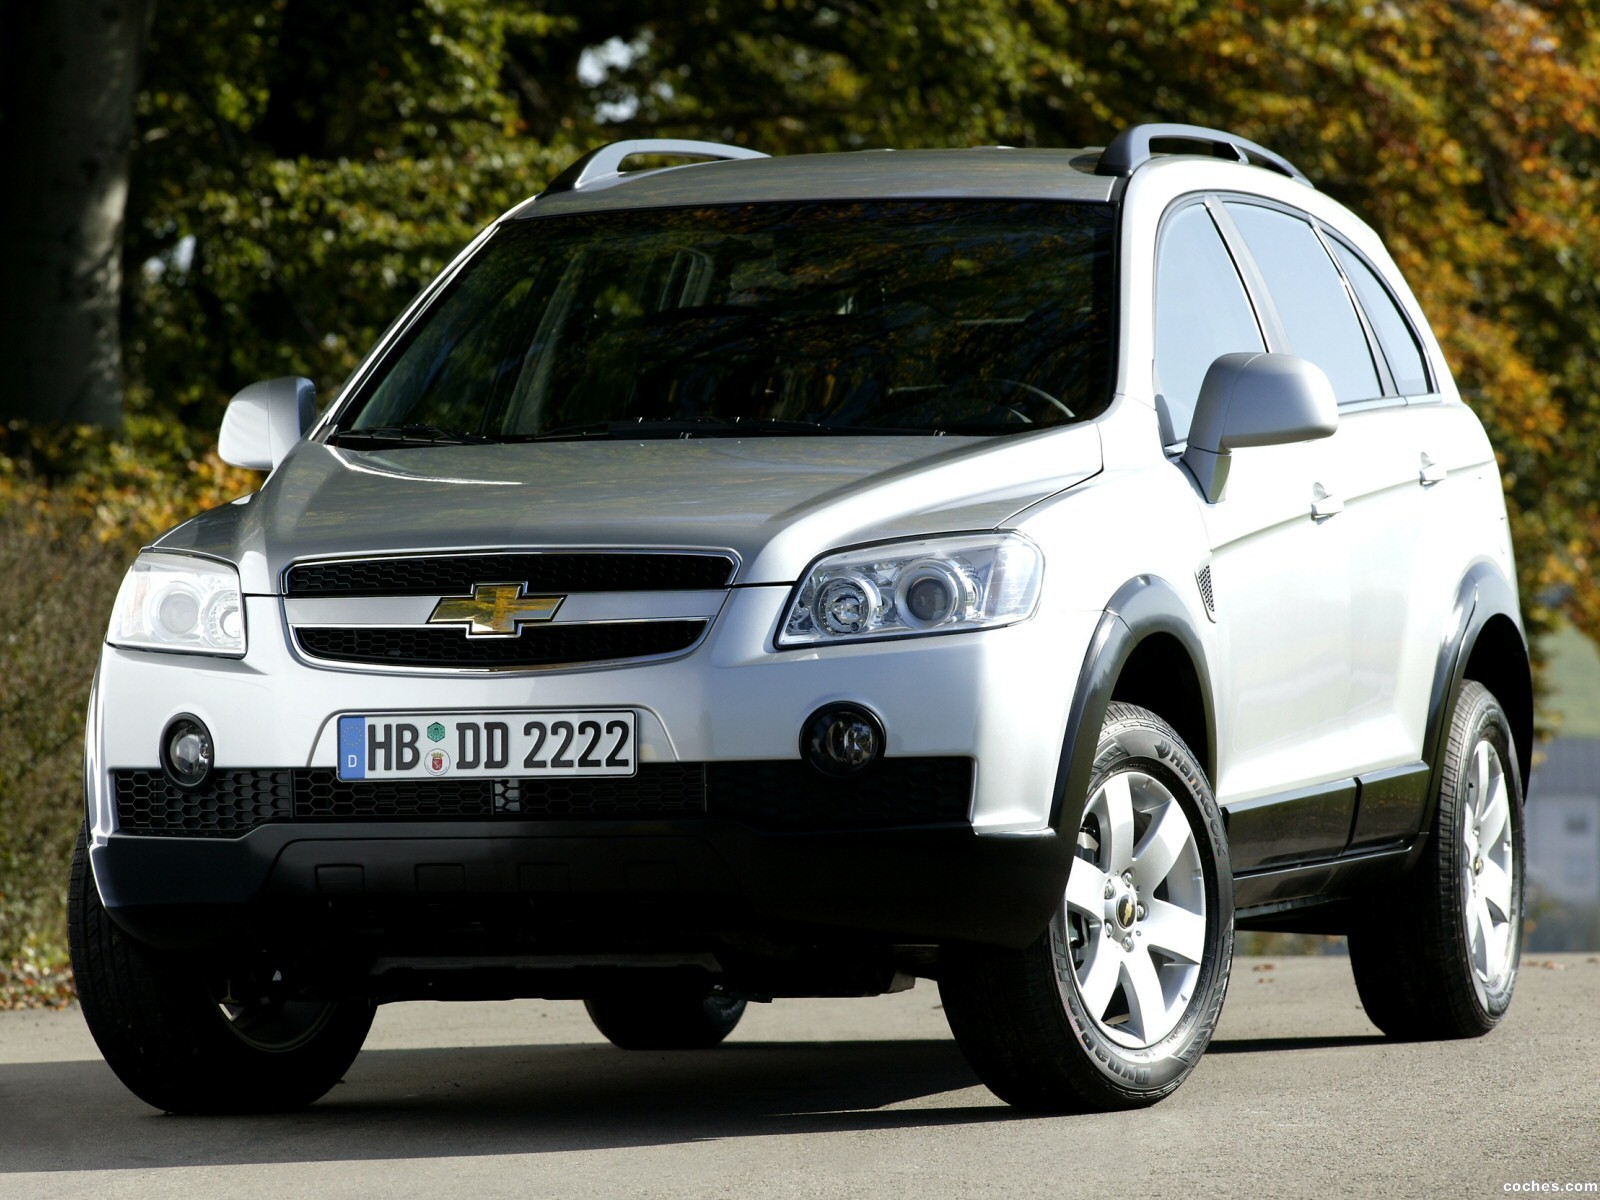 Foto 9 de Chevrolet Captiva 2006